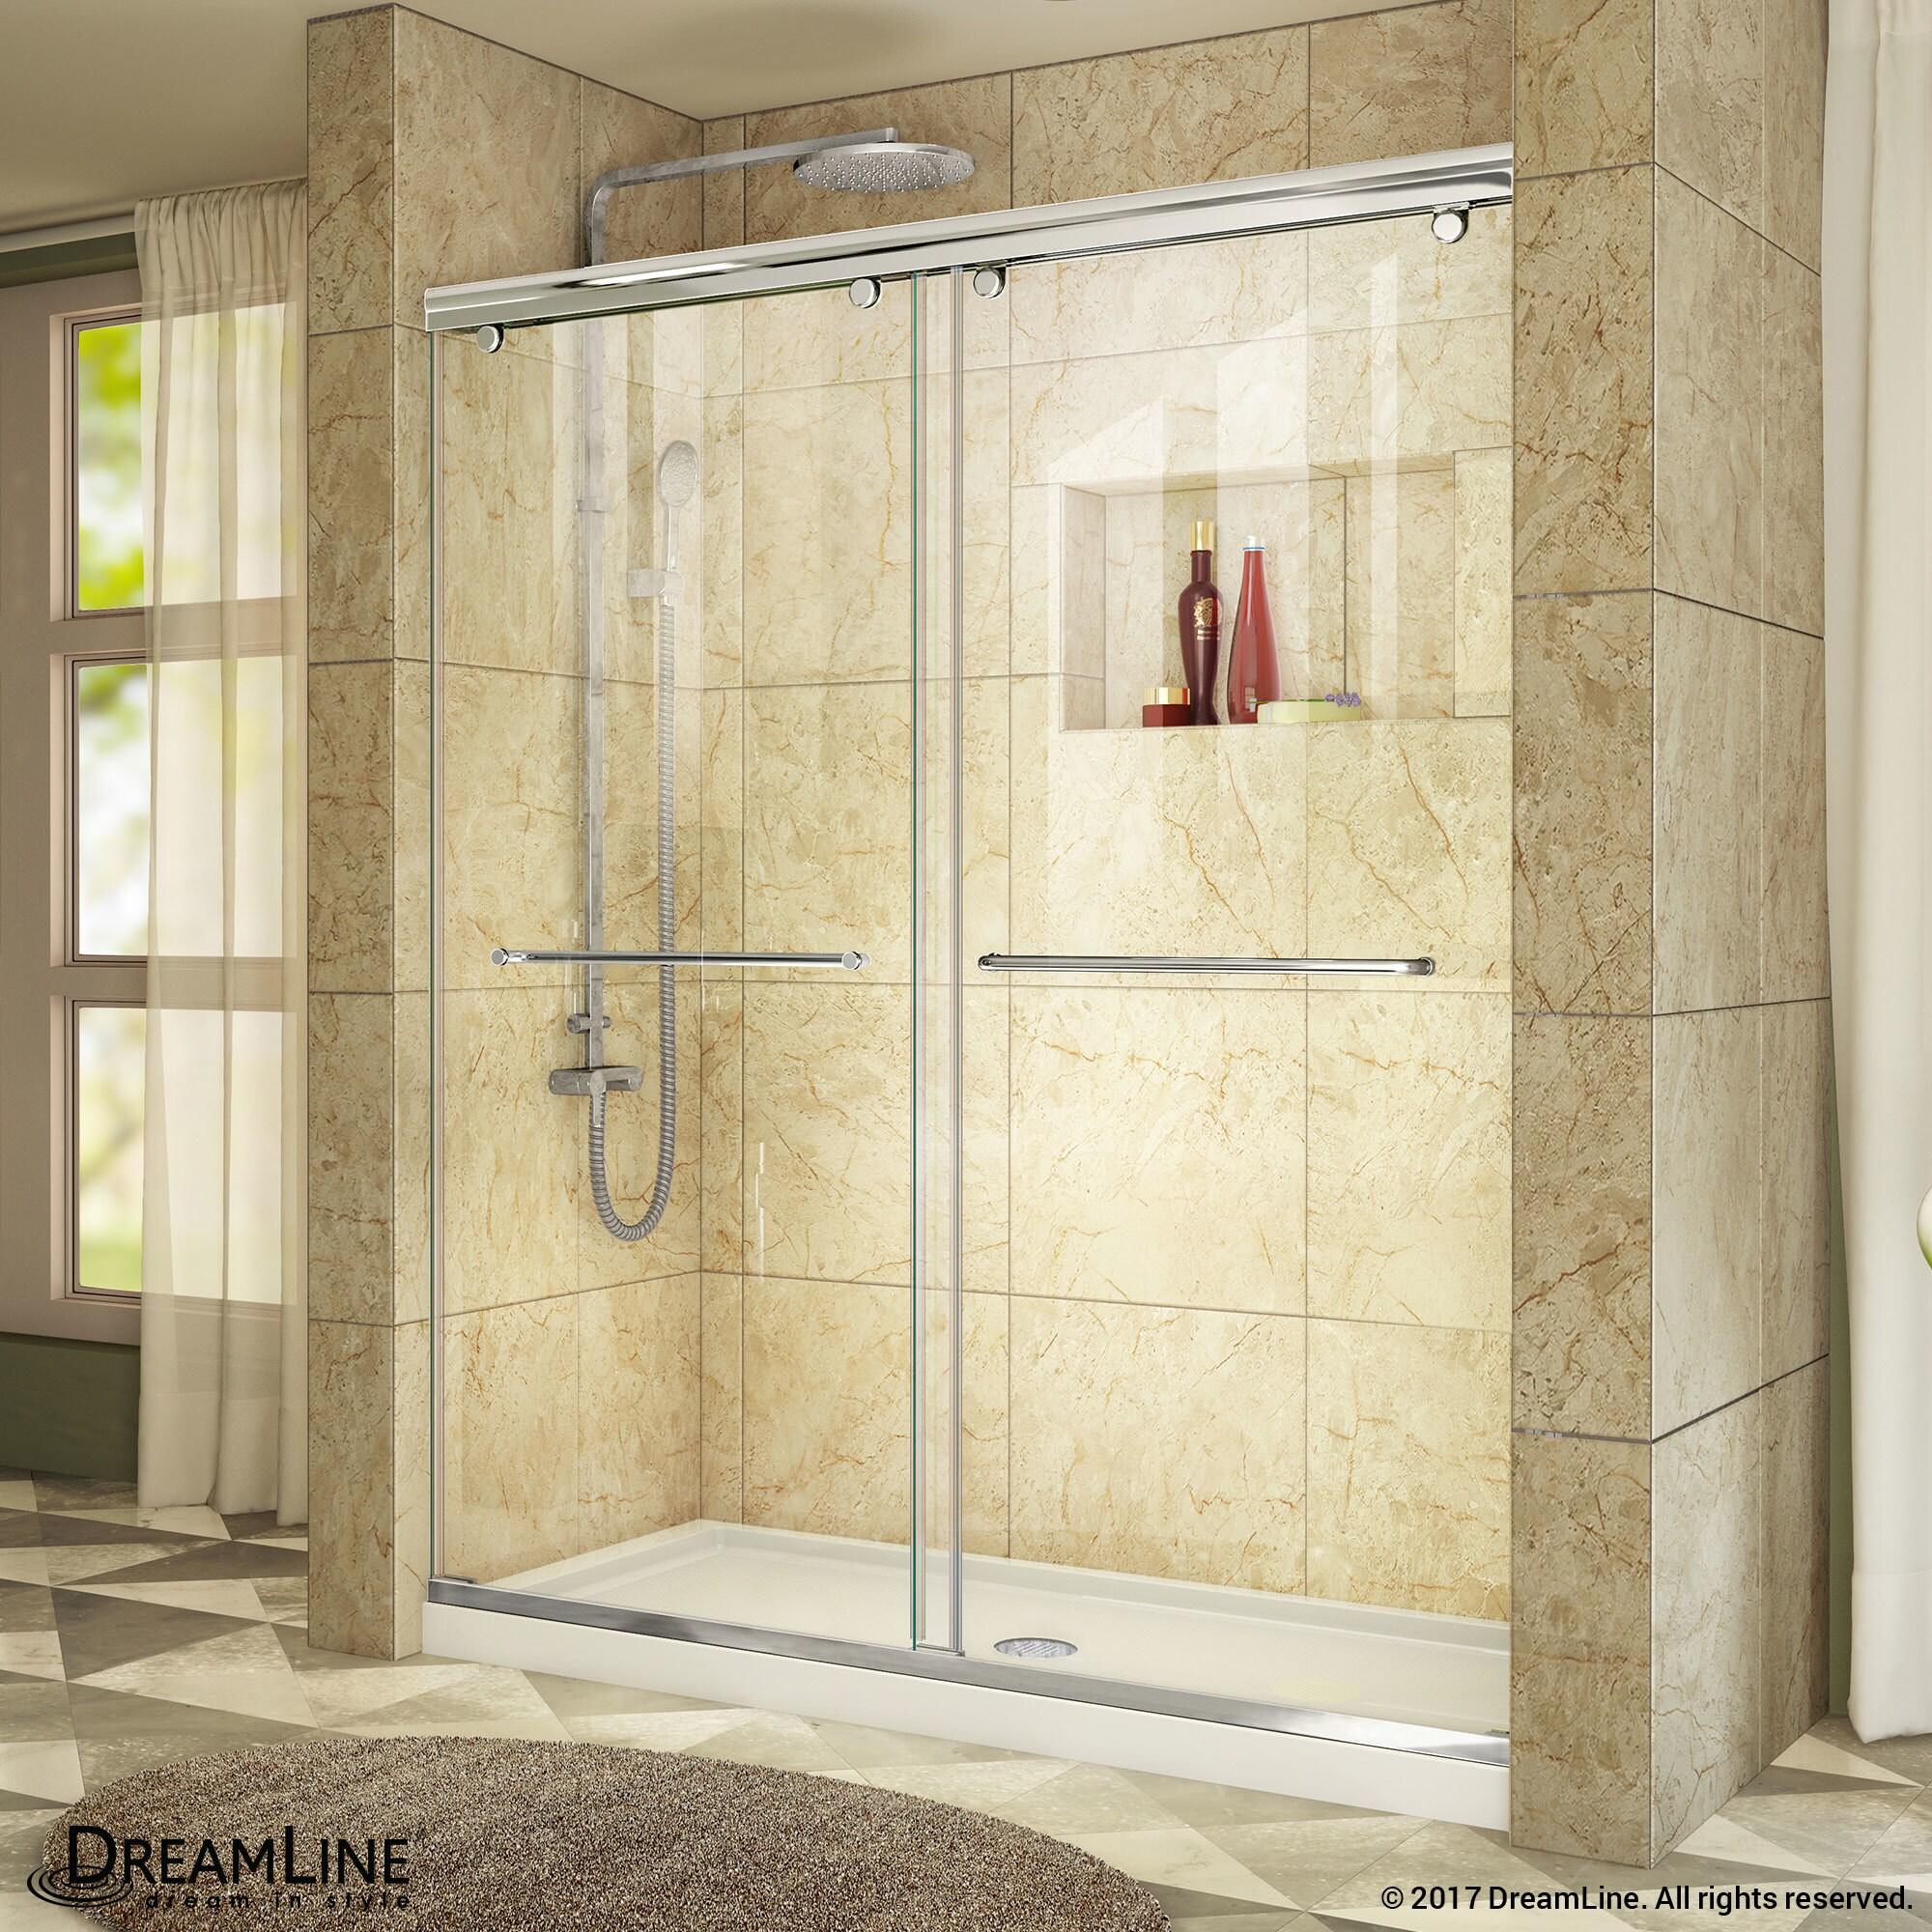 Shop Dreamline Charisma Sliding Shower Door 56 60 In W X 76 In H